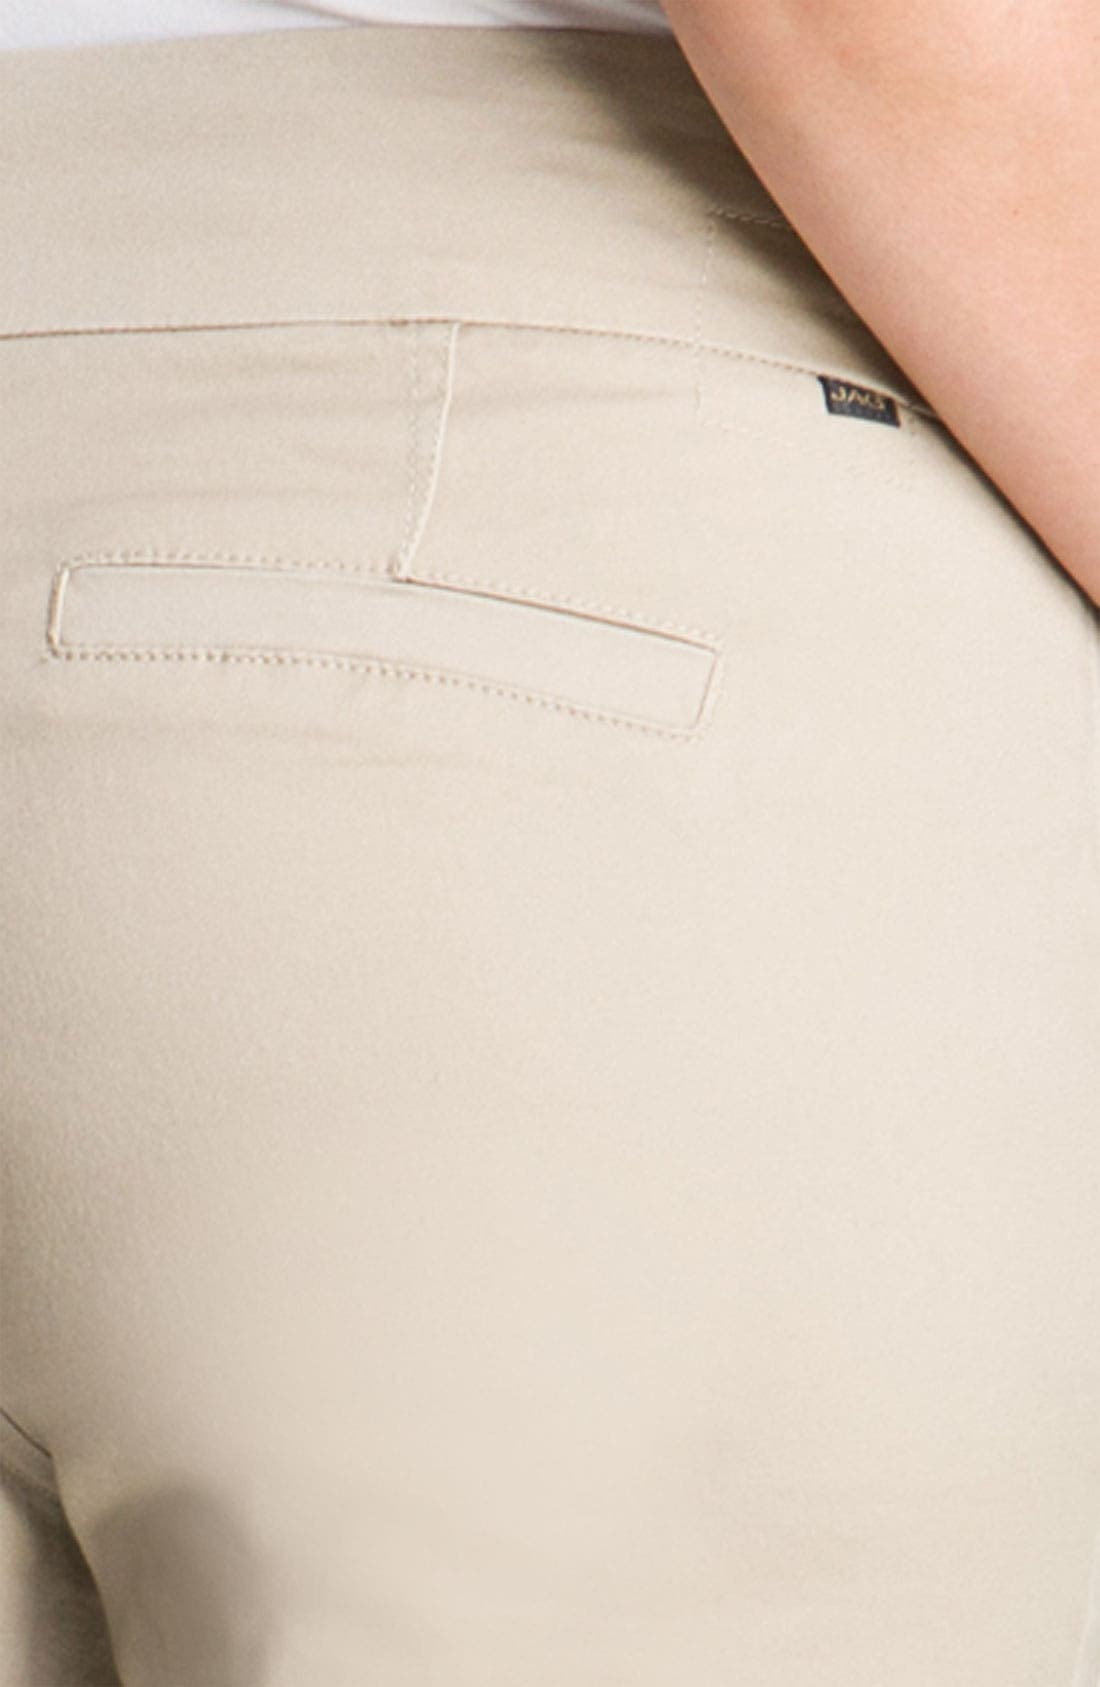 Alternate Image 3  - Jag Jeans 'Attie' Slim Ankle Pants (Plus)